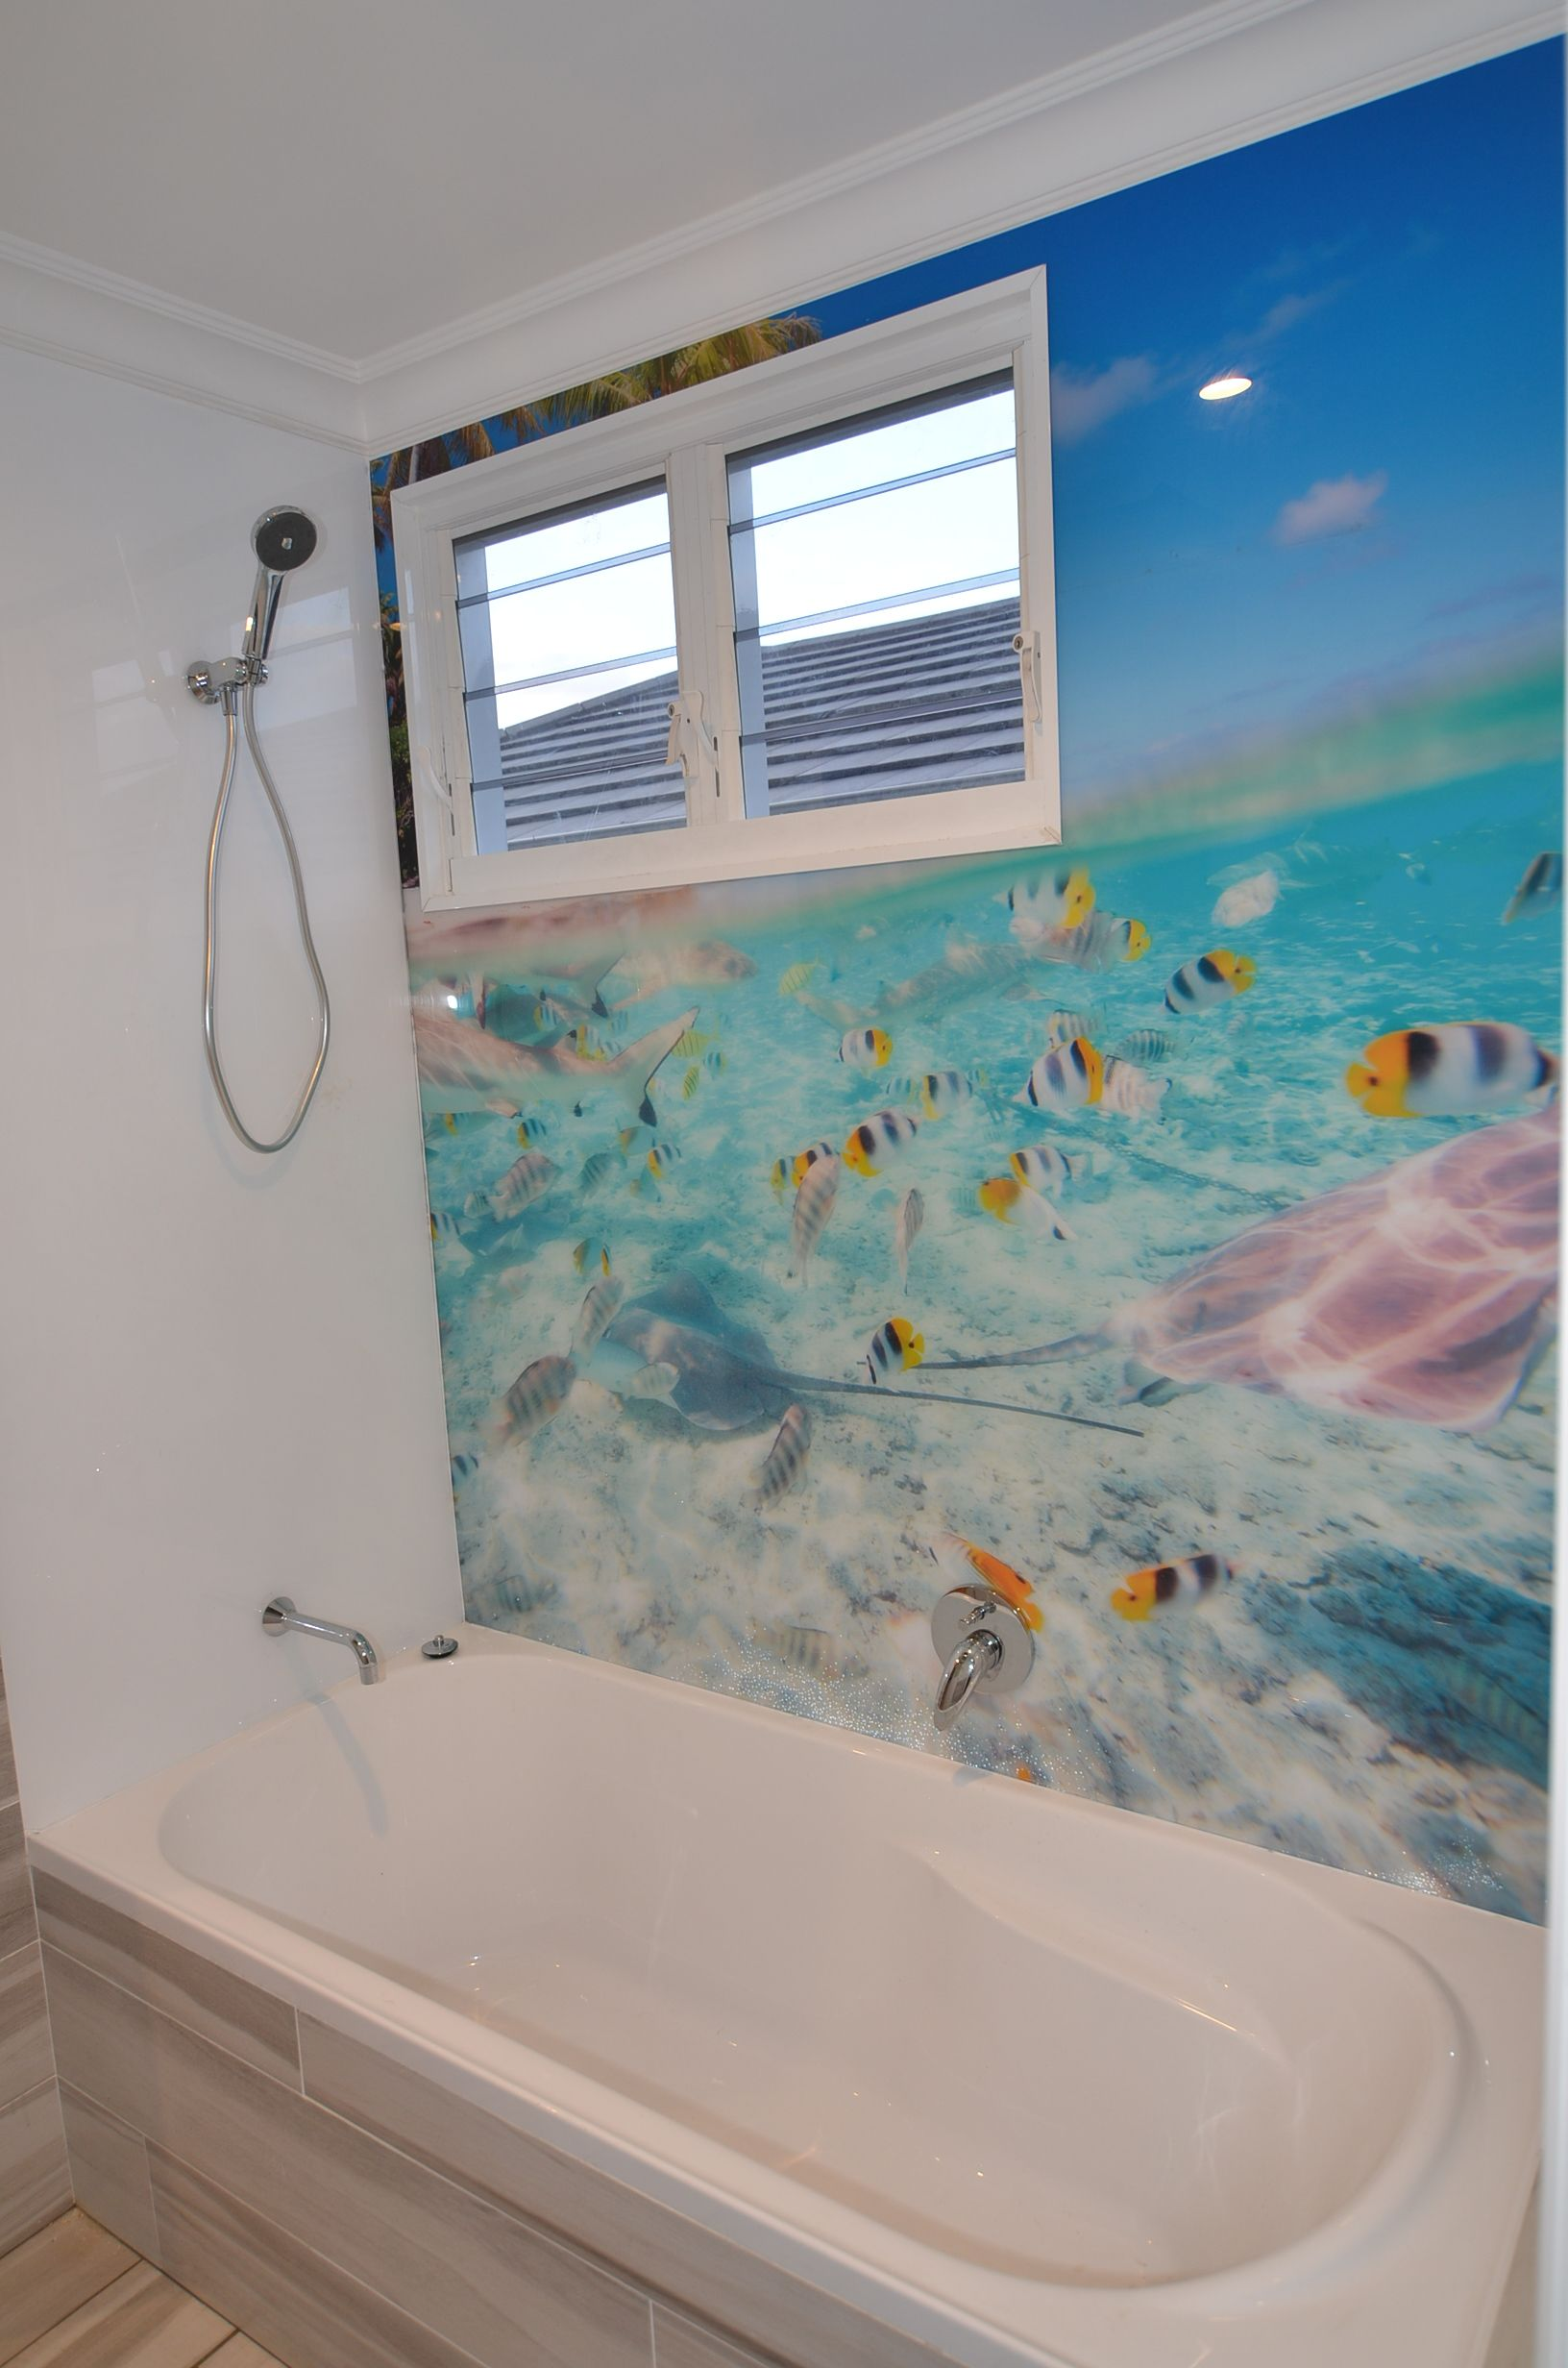 Charming Innovative Splashbacks® Add That #luxury Highclass Finish To Any Space.  This #bathroom